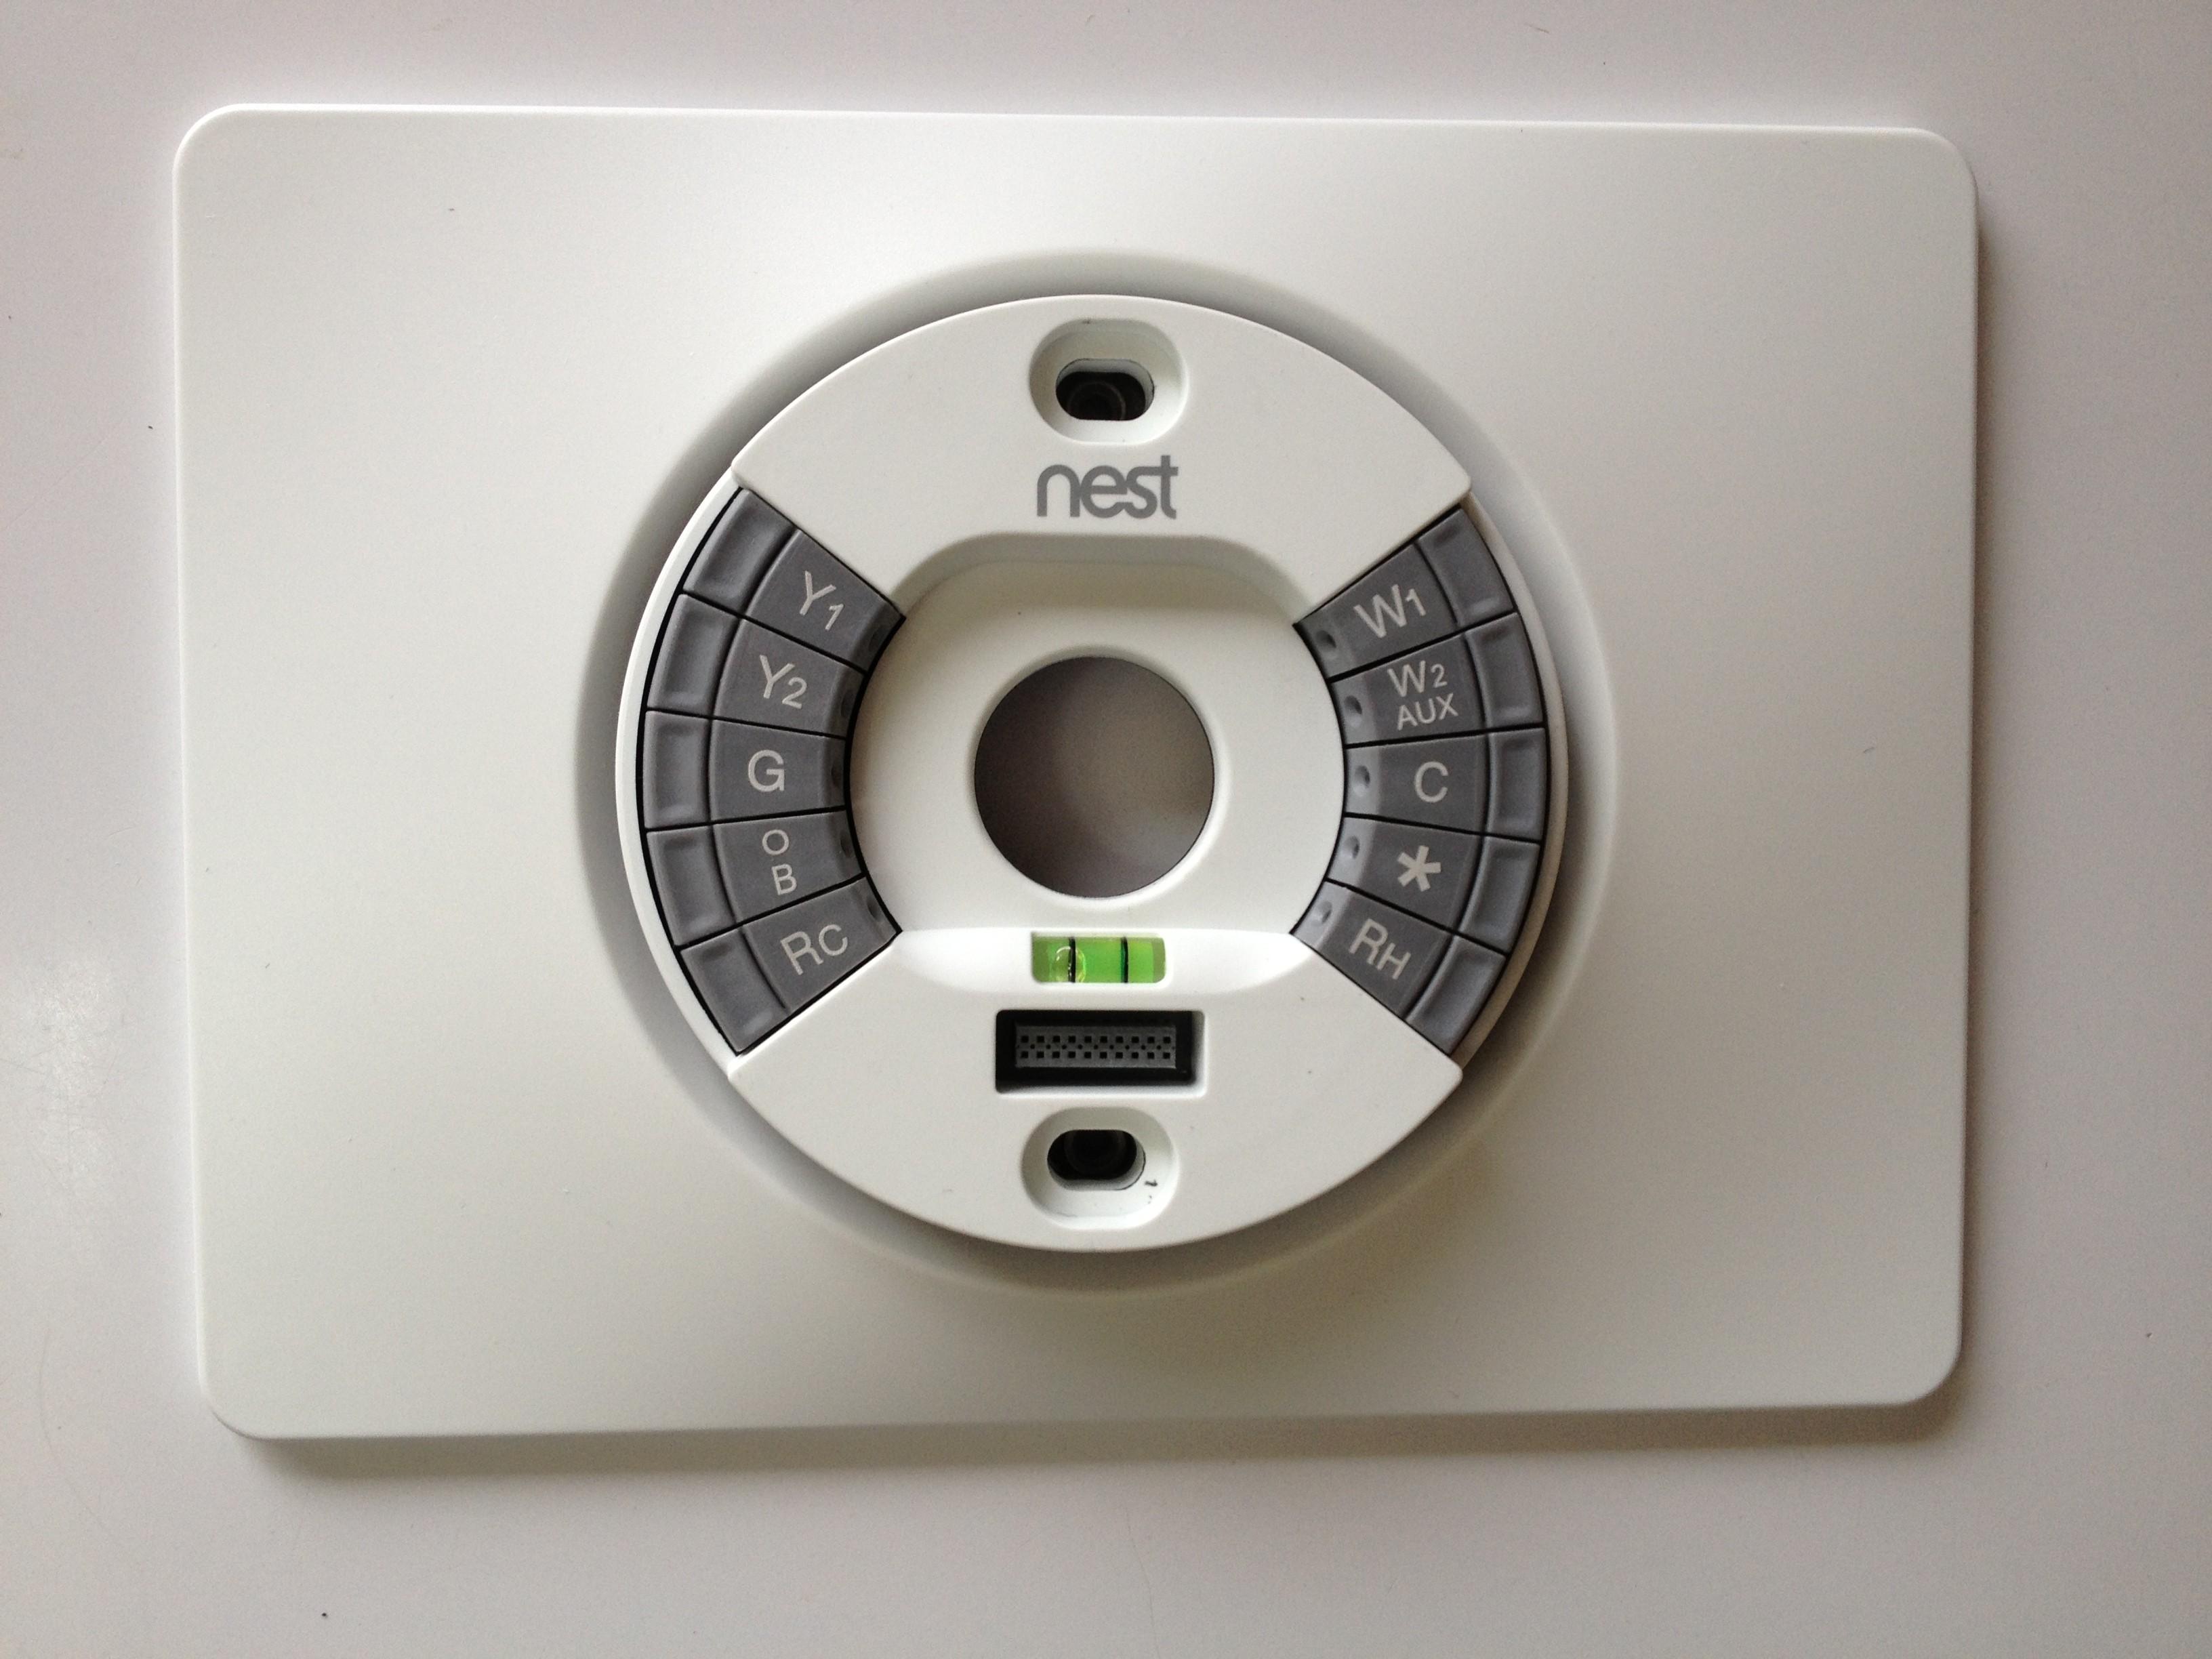 Nest Thermostat Wiring Plate Basic Guide Diagram Heat Pump The Johnston Architects Rh Johnstonarchitects Com E